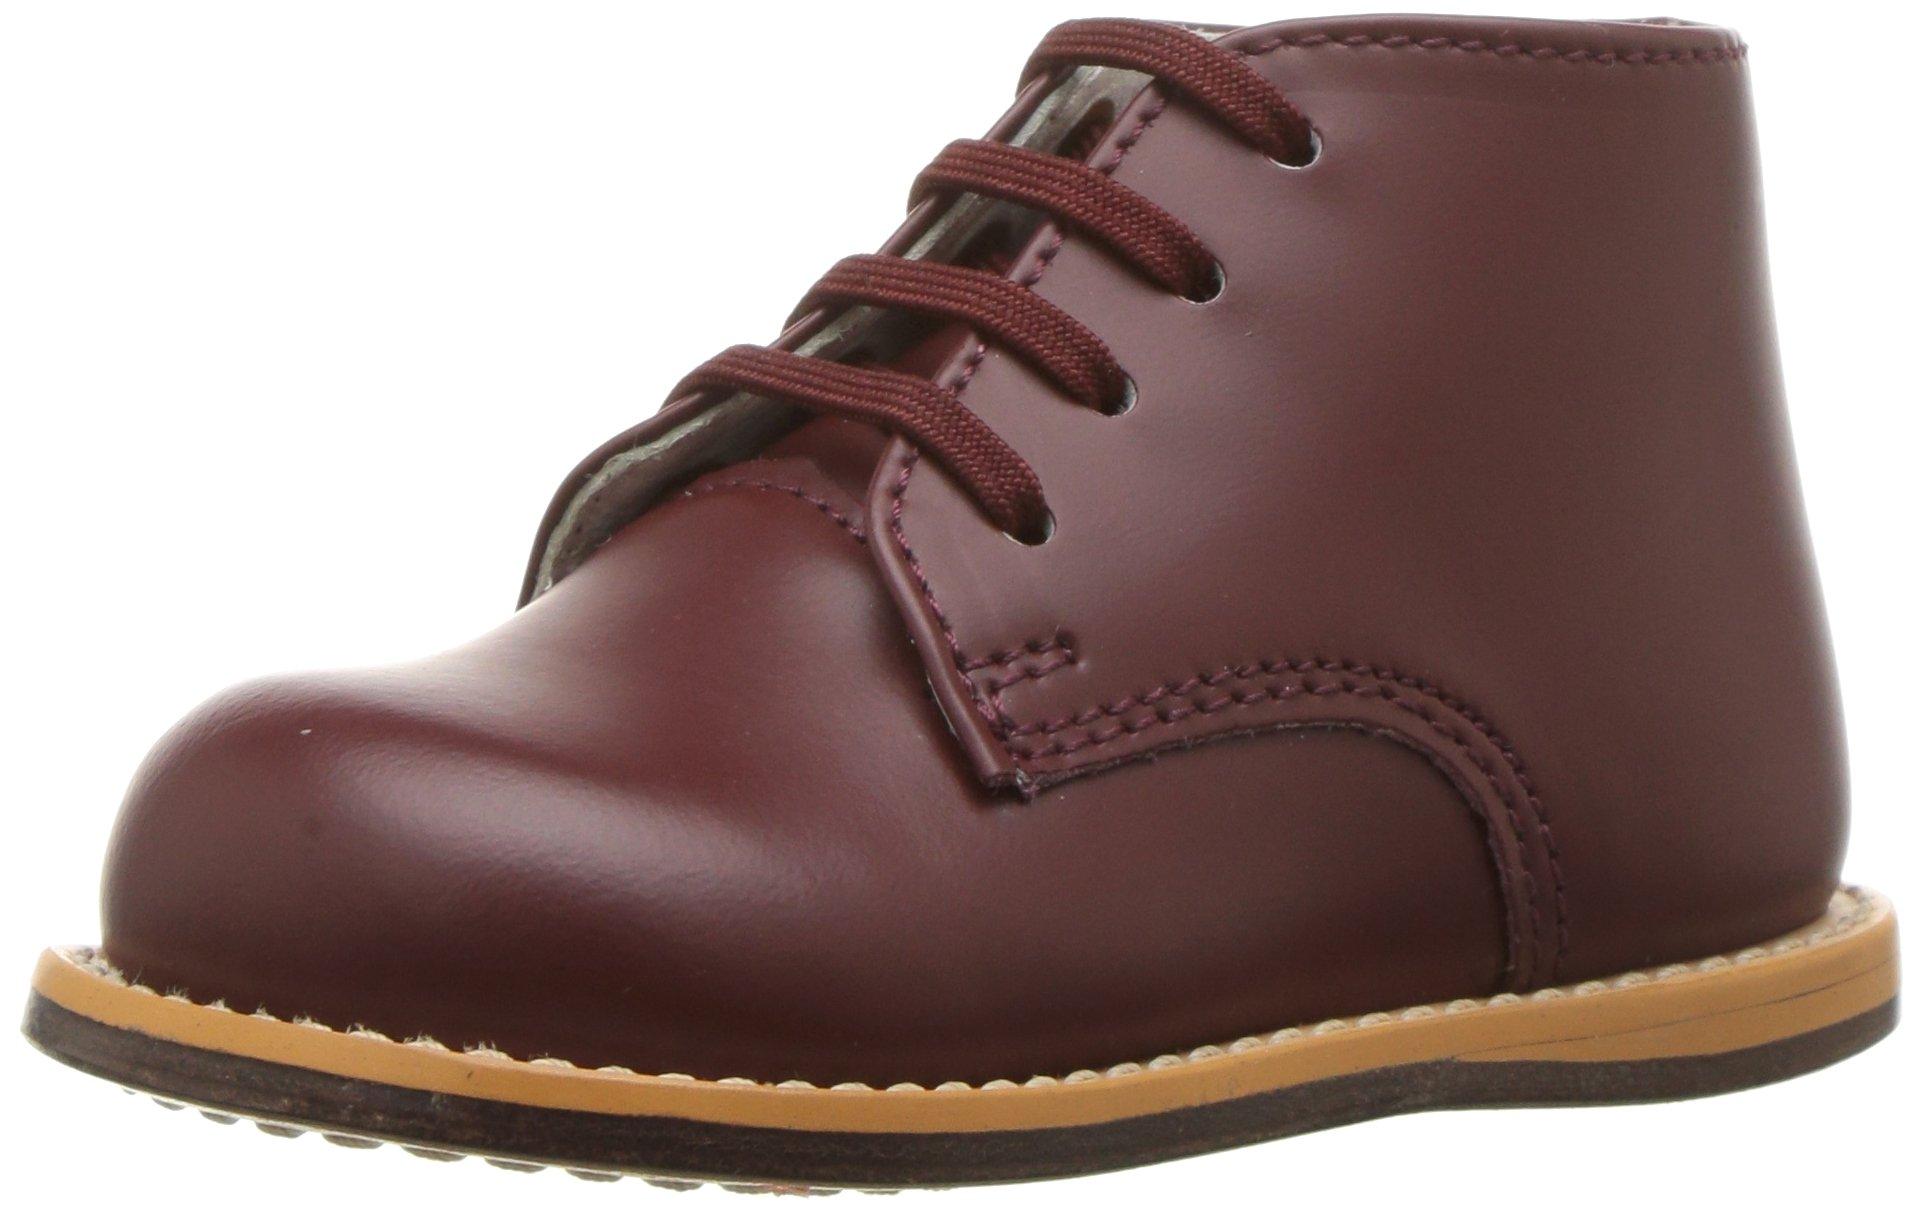 Josmo - Baby Walker Leather Dress Shoe, Burgundy 38216-7MUSToddler